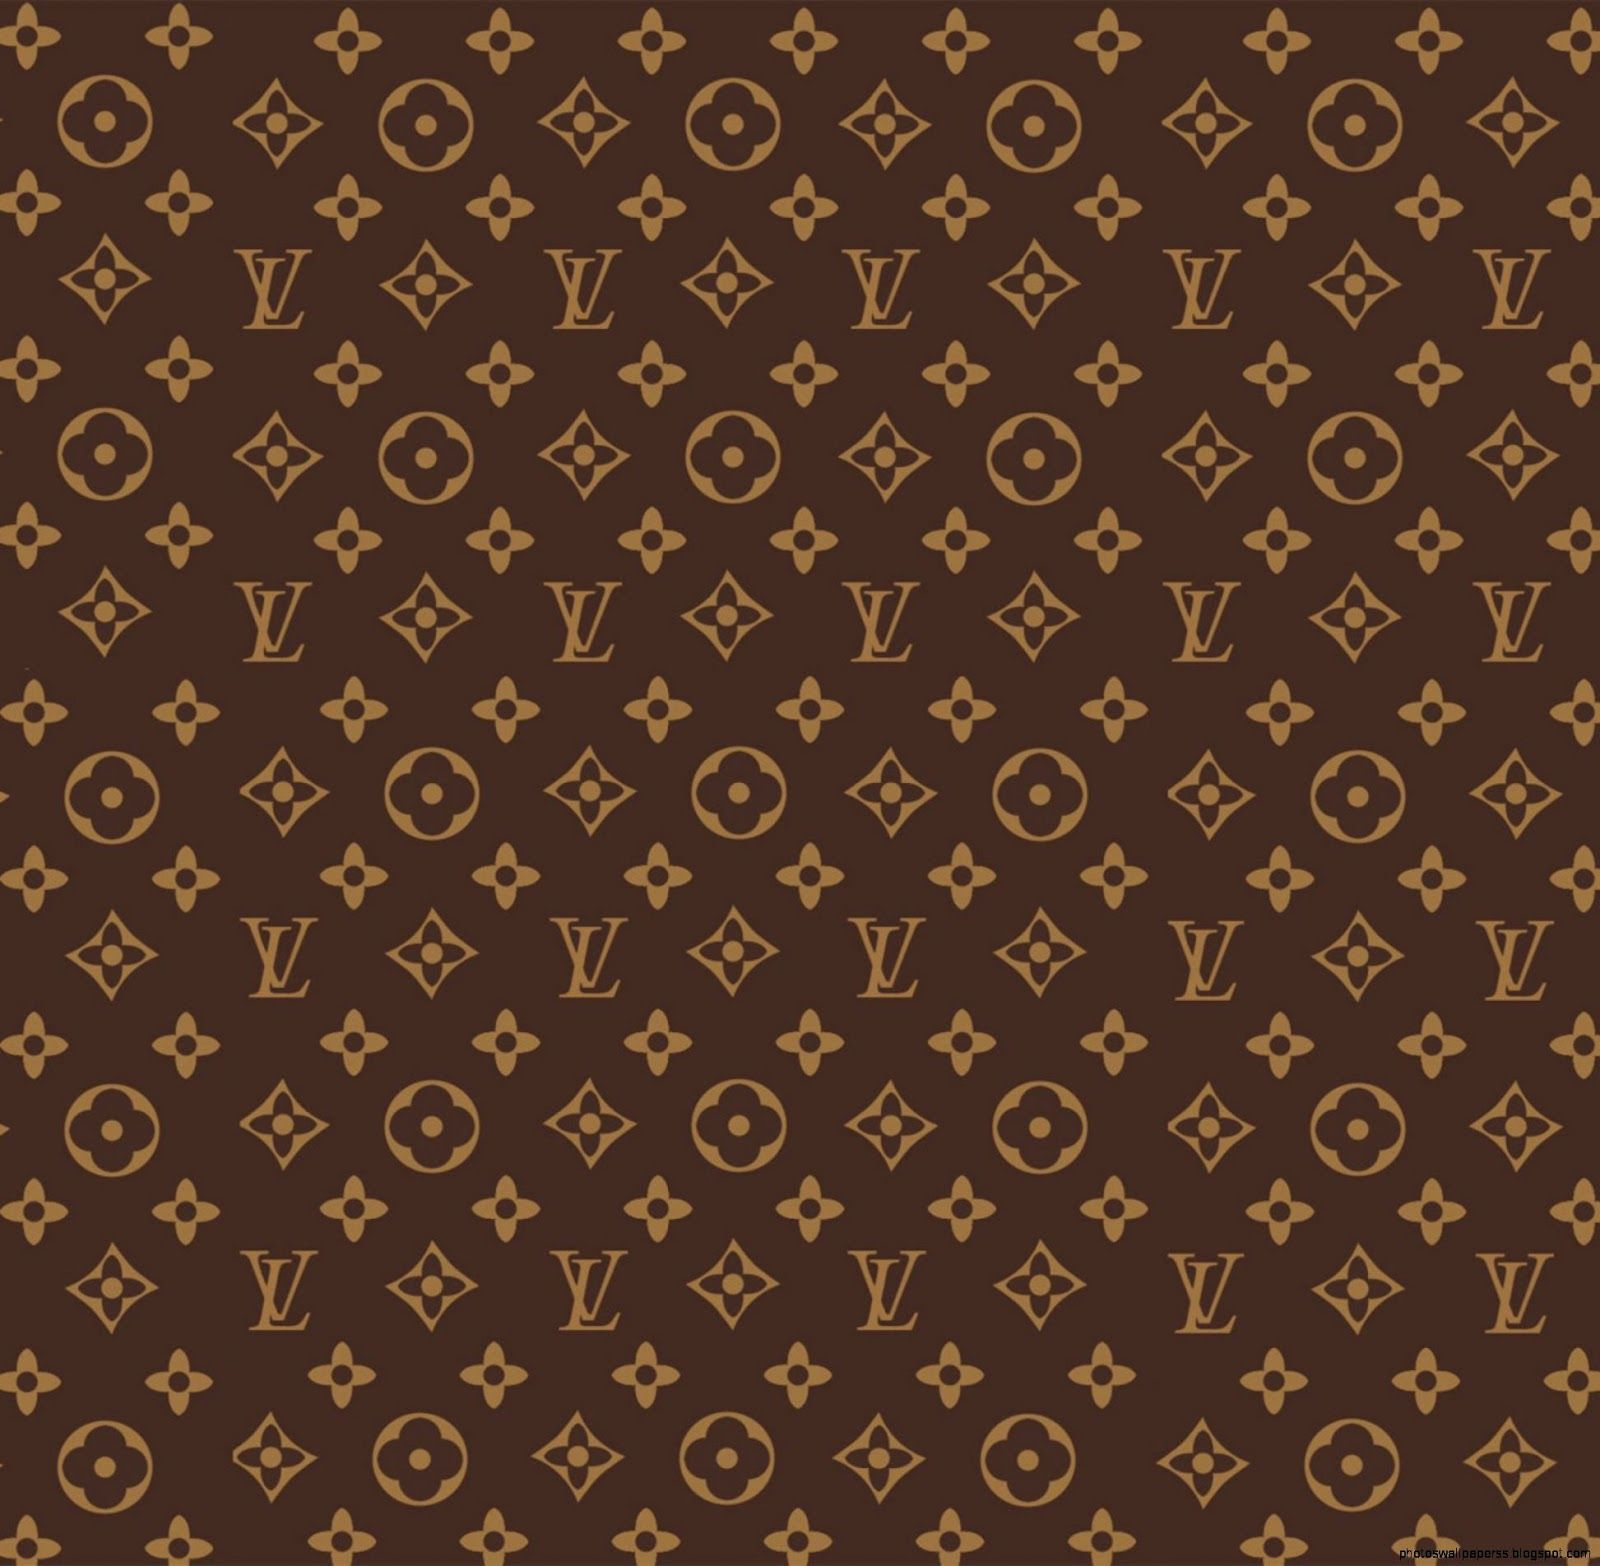 Louis Vuitton Iphone Wallpapers Top Free Louis Vuitton Iphone Backgrounds Wallpaperaccess